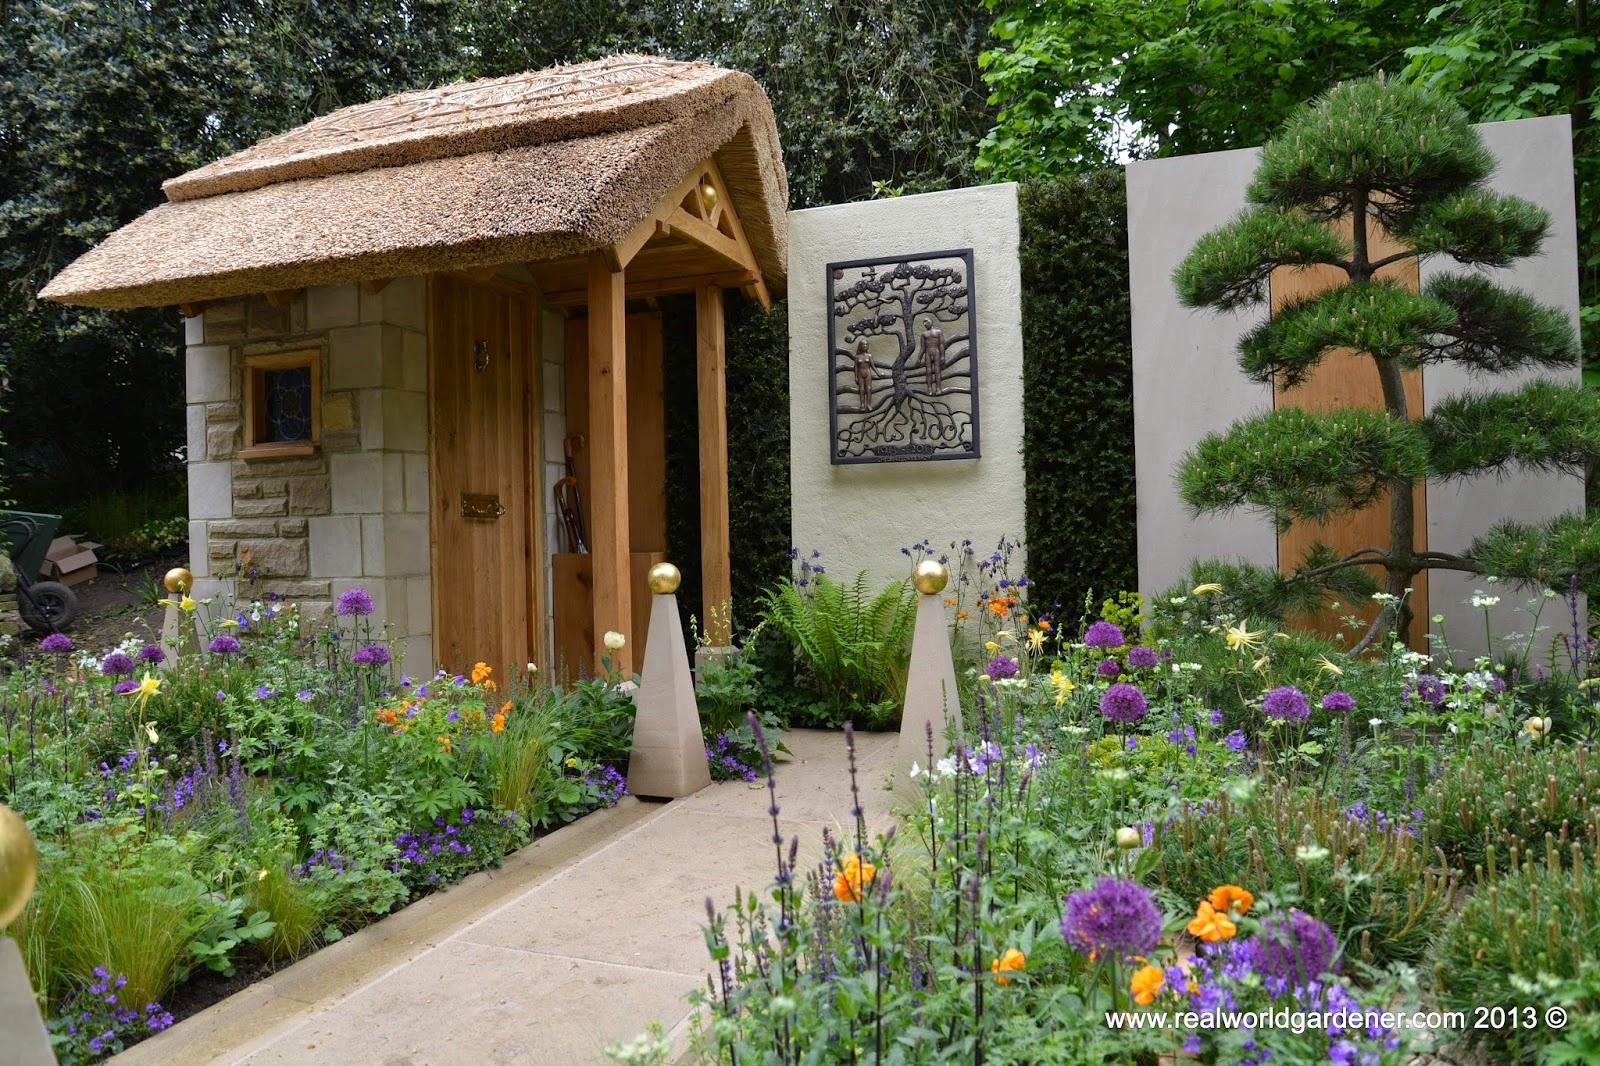 real world gardener concept gardens in garden design. Black Bedroom Furniture Sets. Home Design Ideas